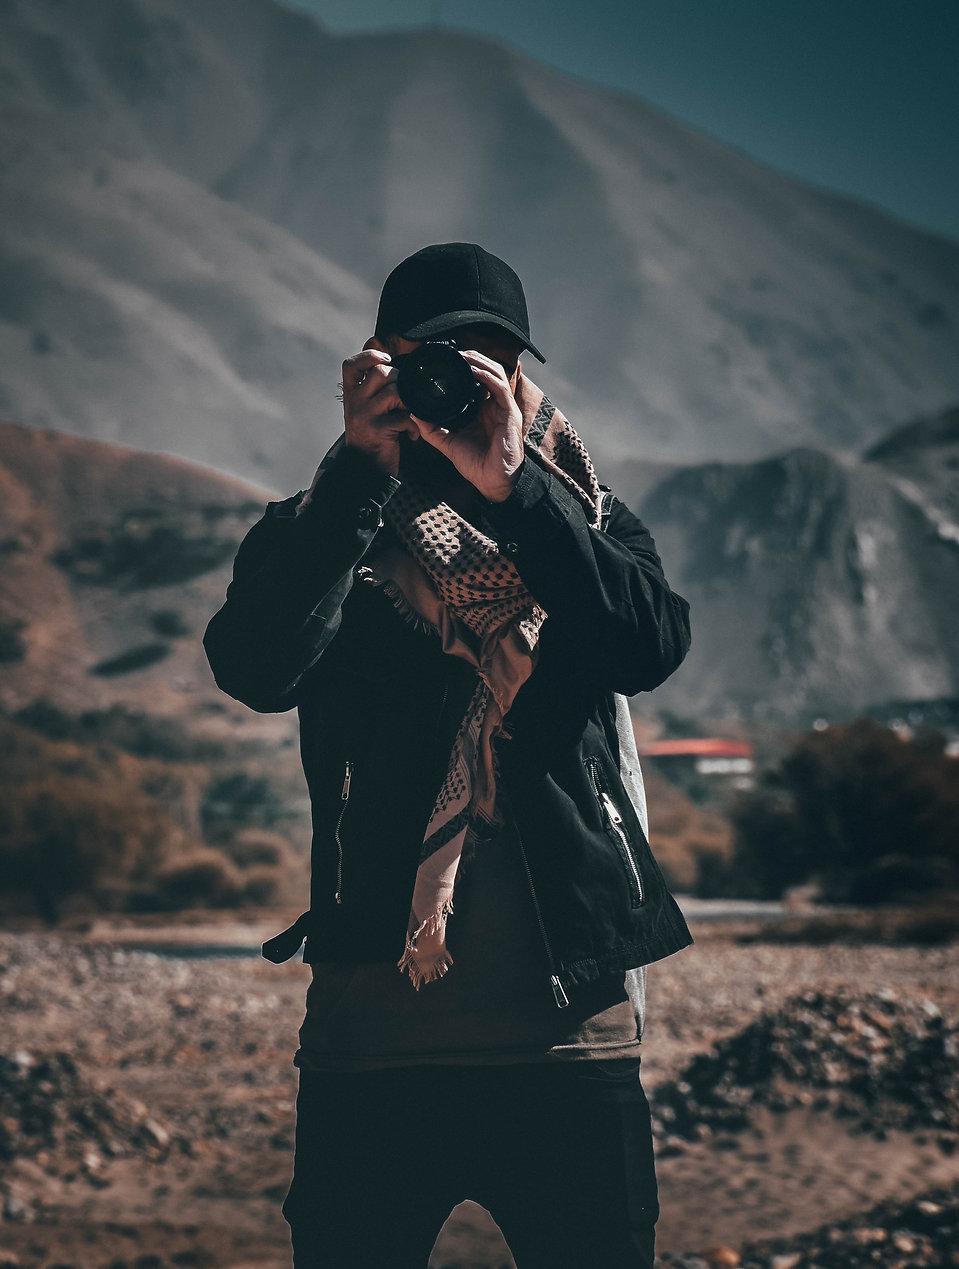 person-holding-camera-1704488.jpg